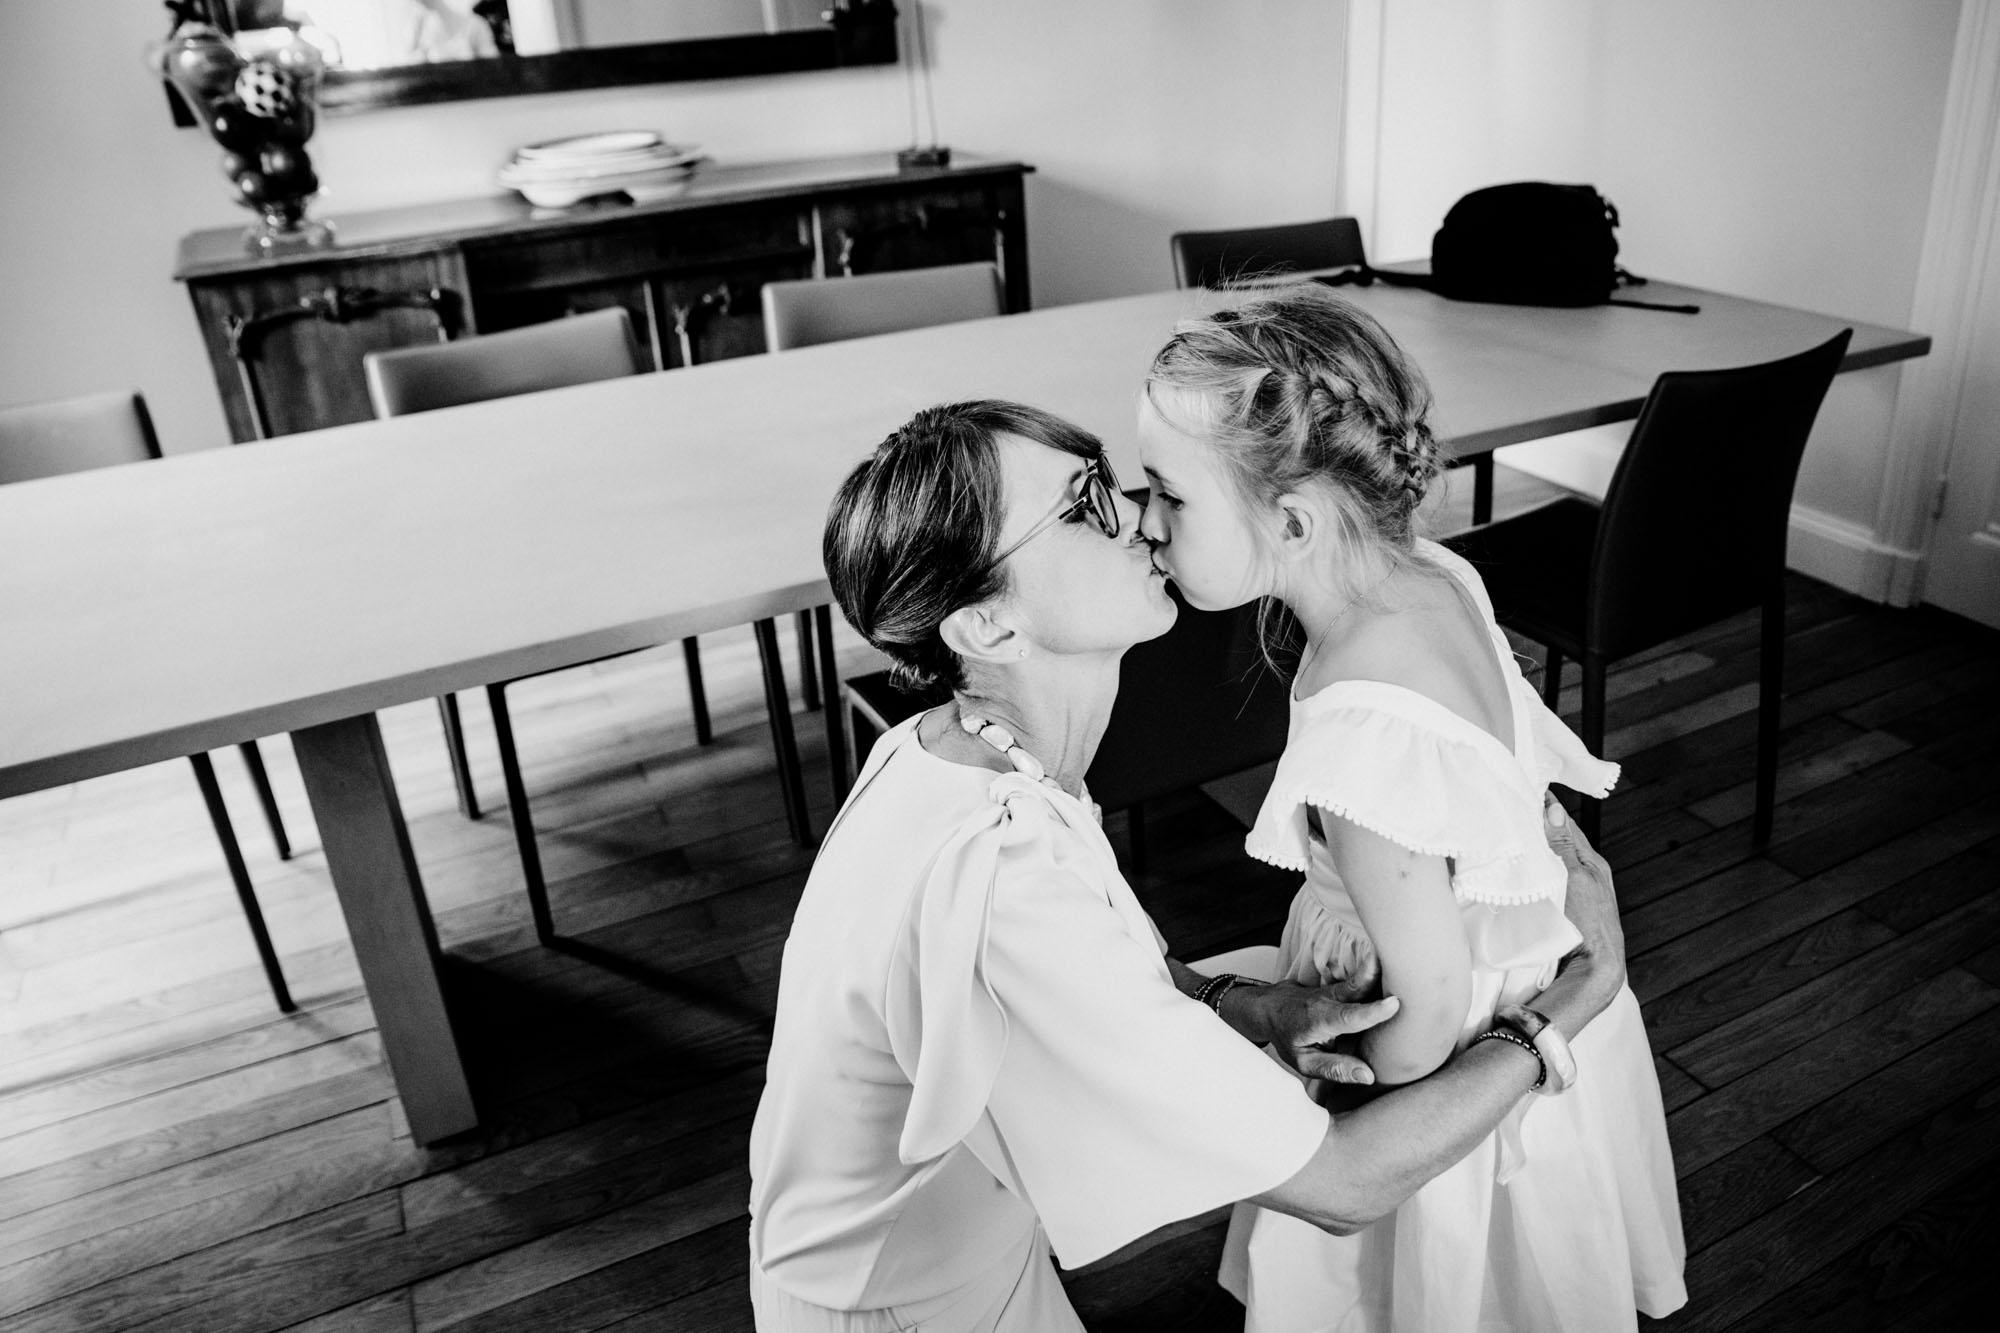 2018-07-21 - LD8_9563 - photographe mariage lyon - laurie diaz - www.lauriediazweeding.com.jpg